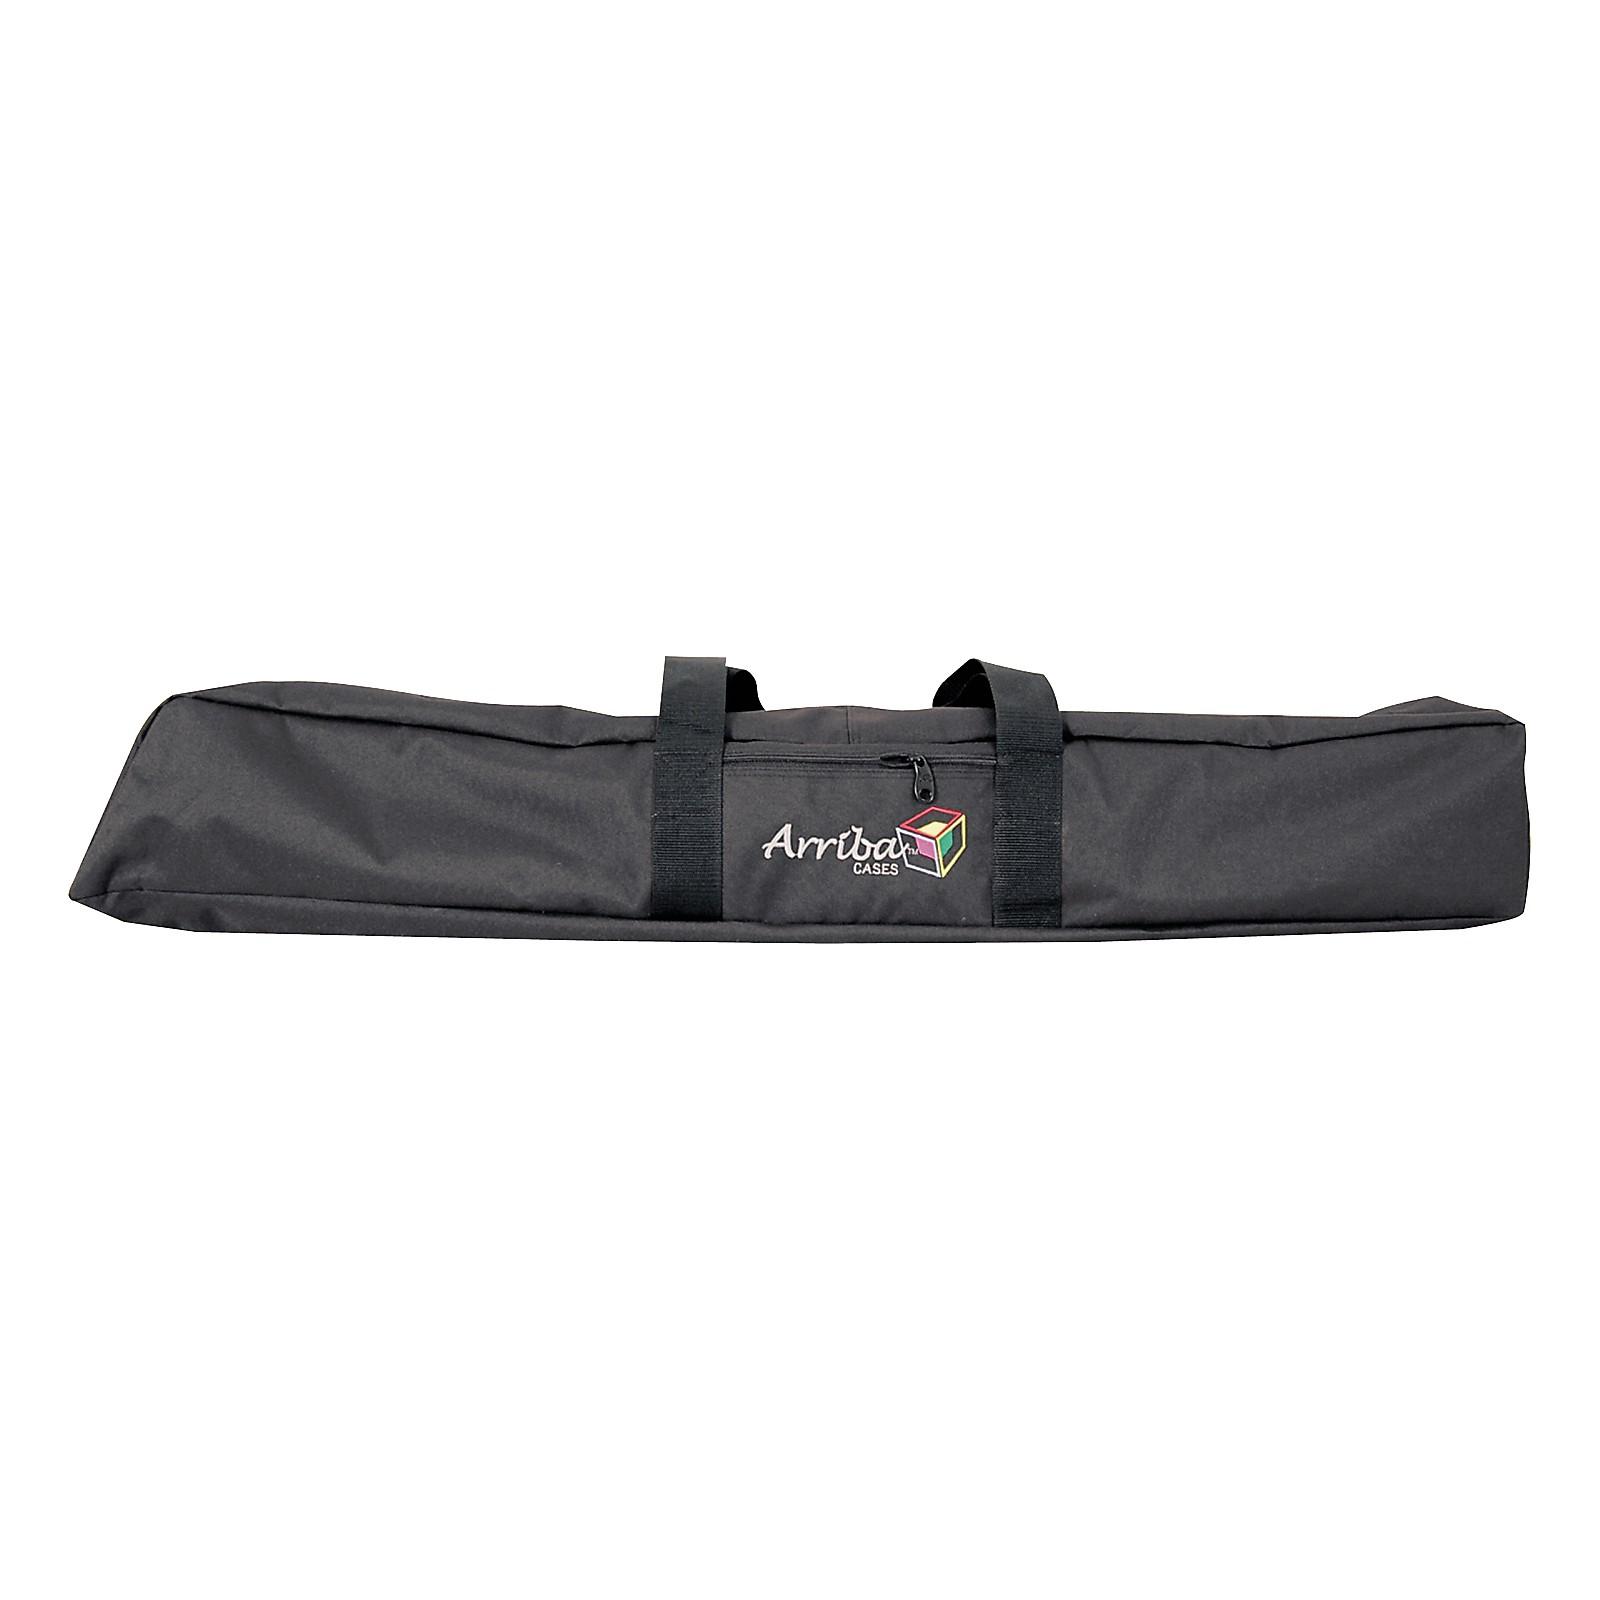 Arriba Cases AS-171 Deluxe Tripod Speaker Stand Bag